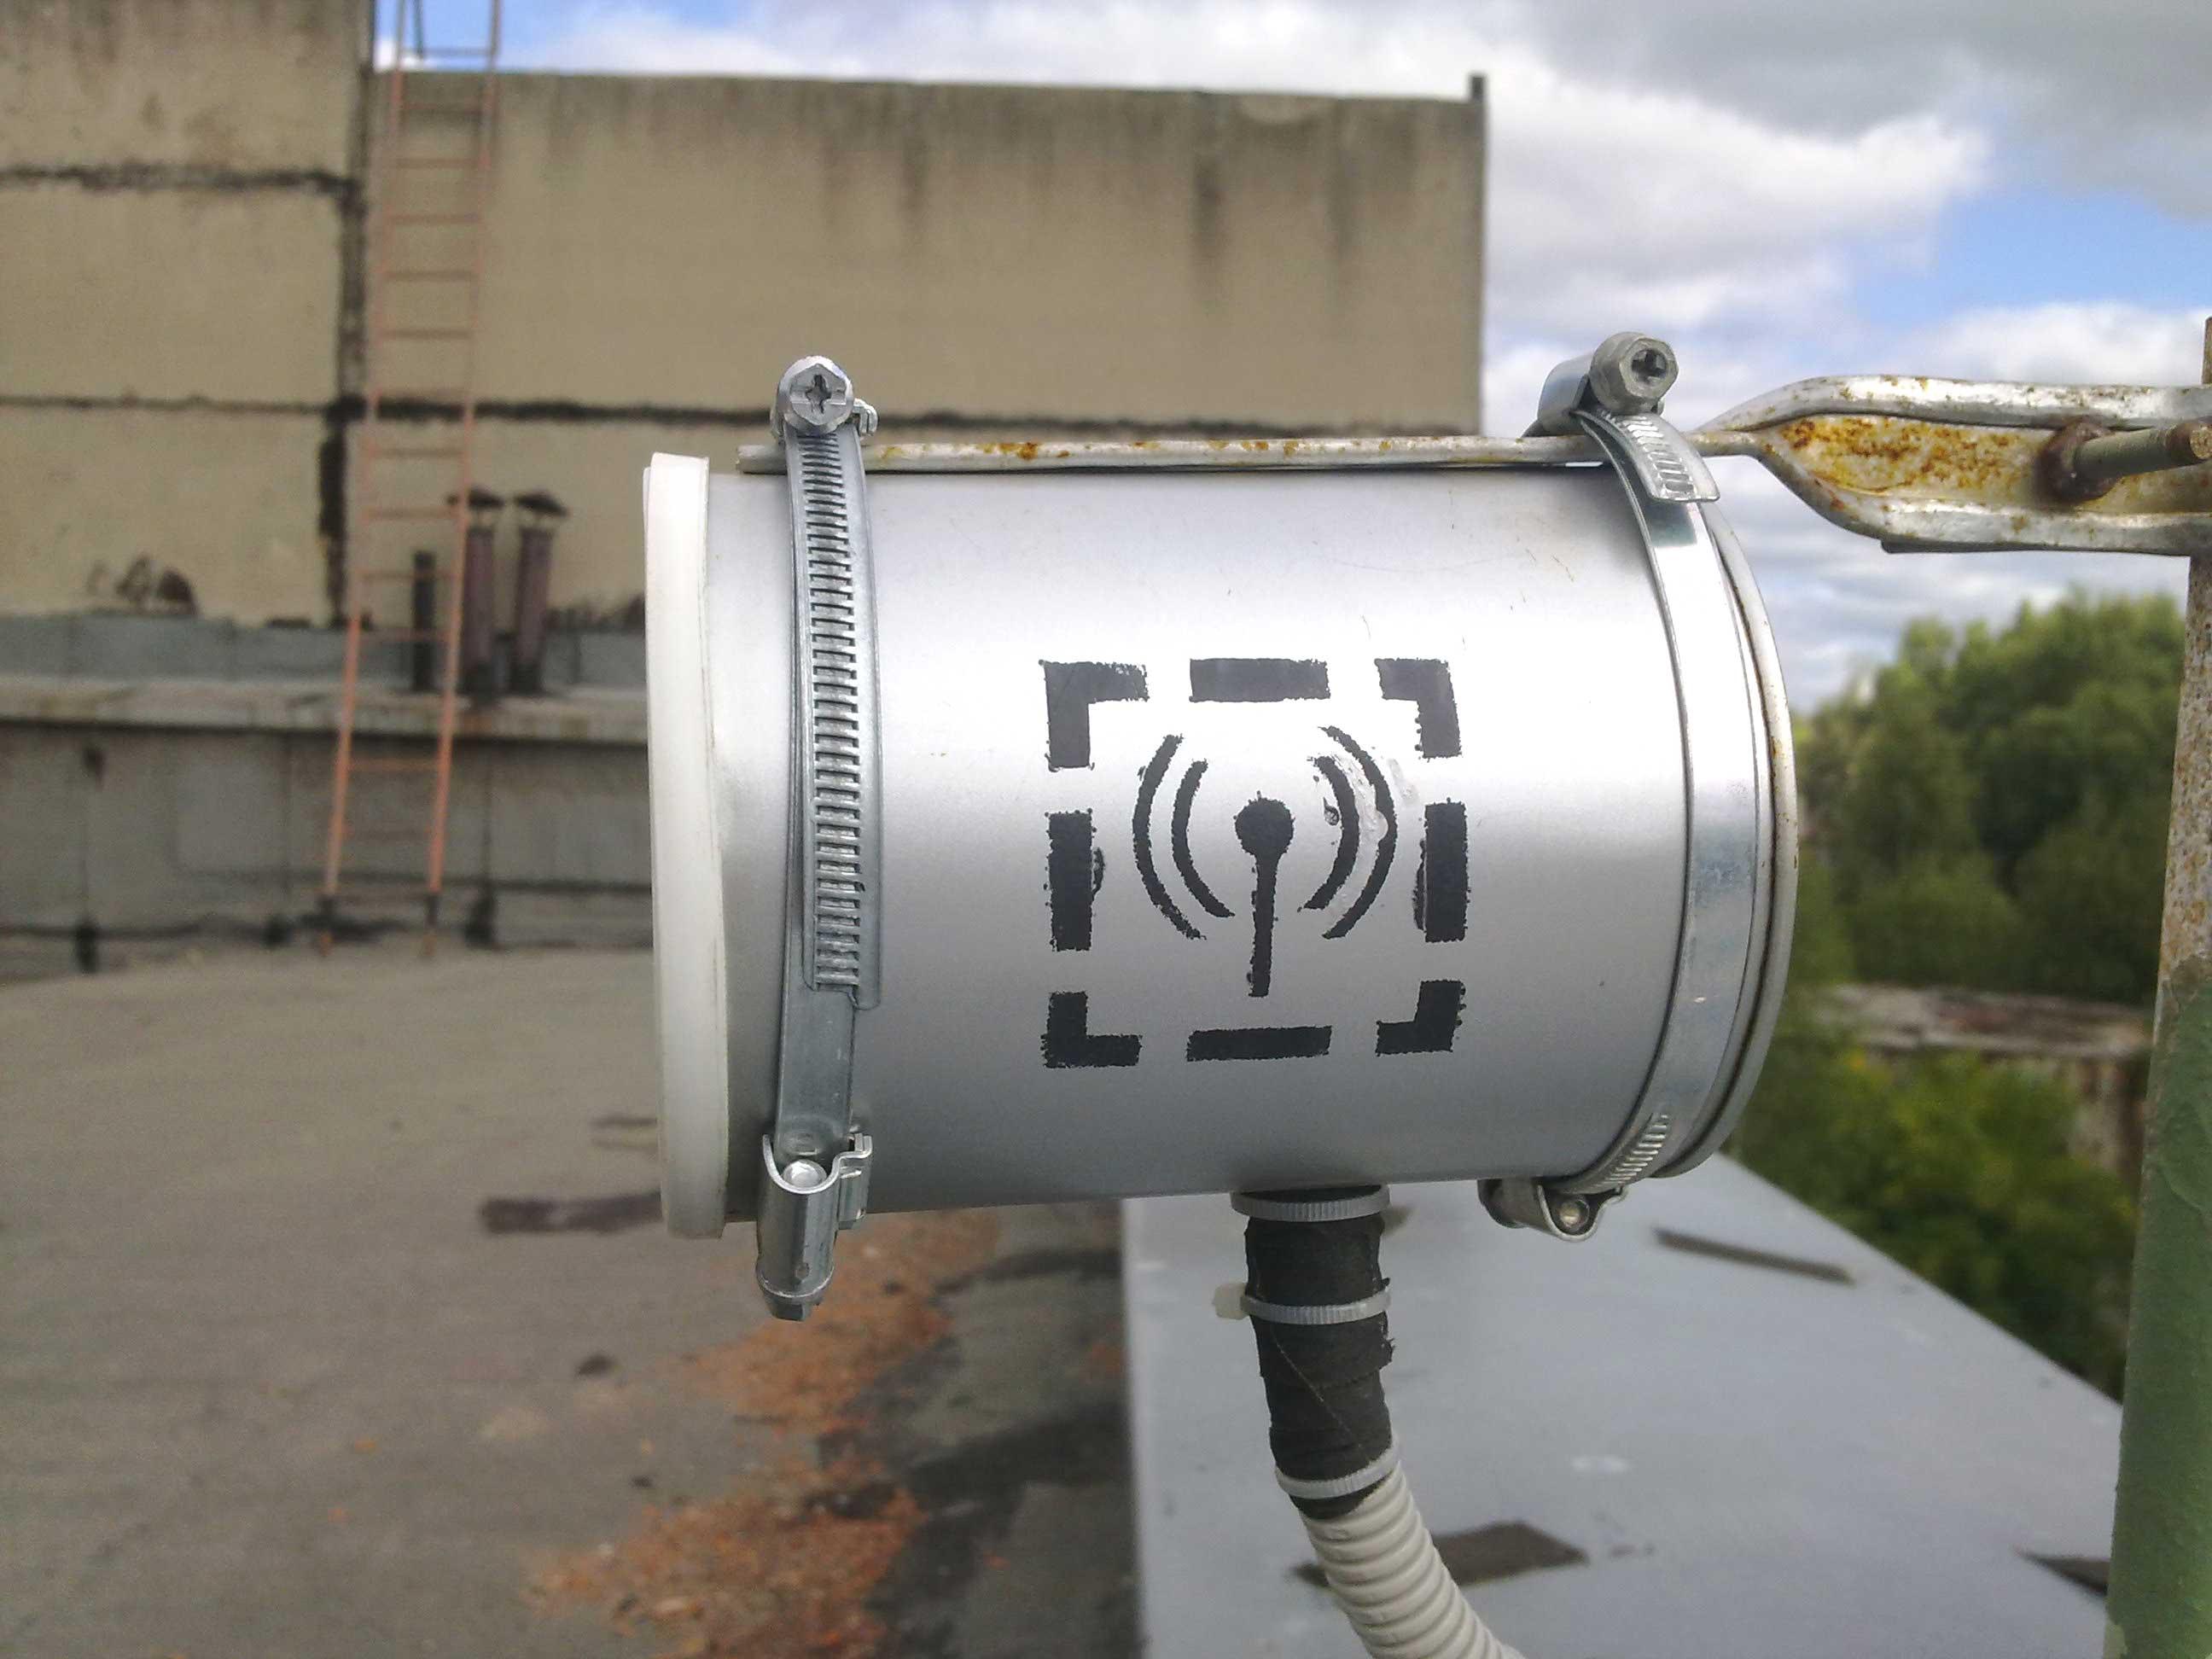 Баночная антенна для 3g модема